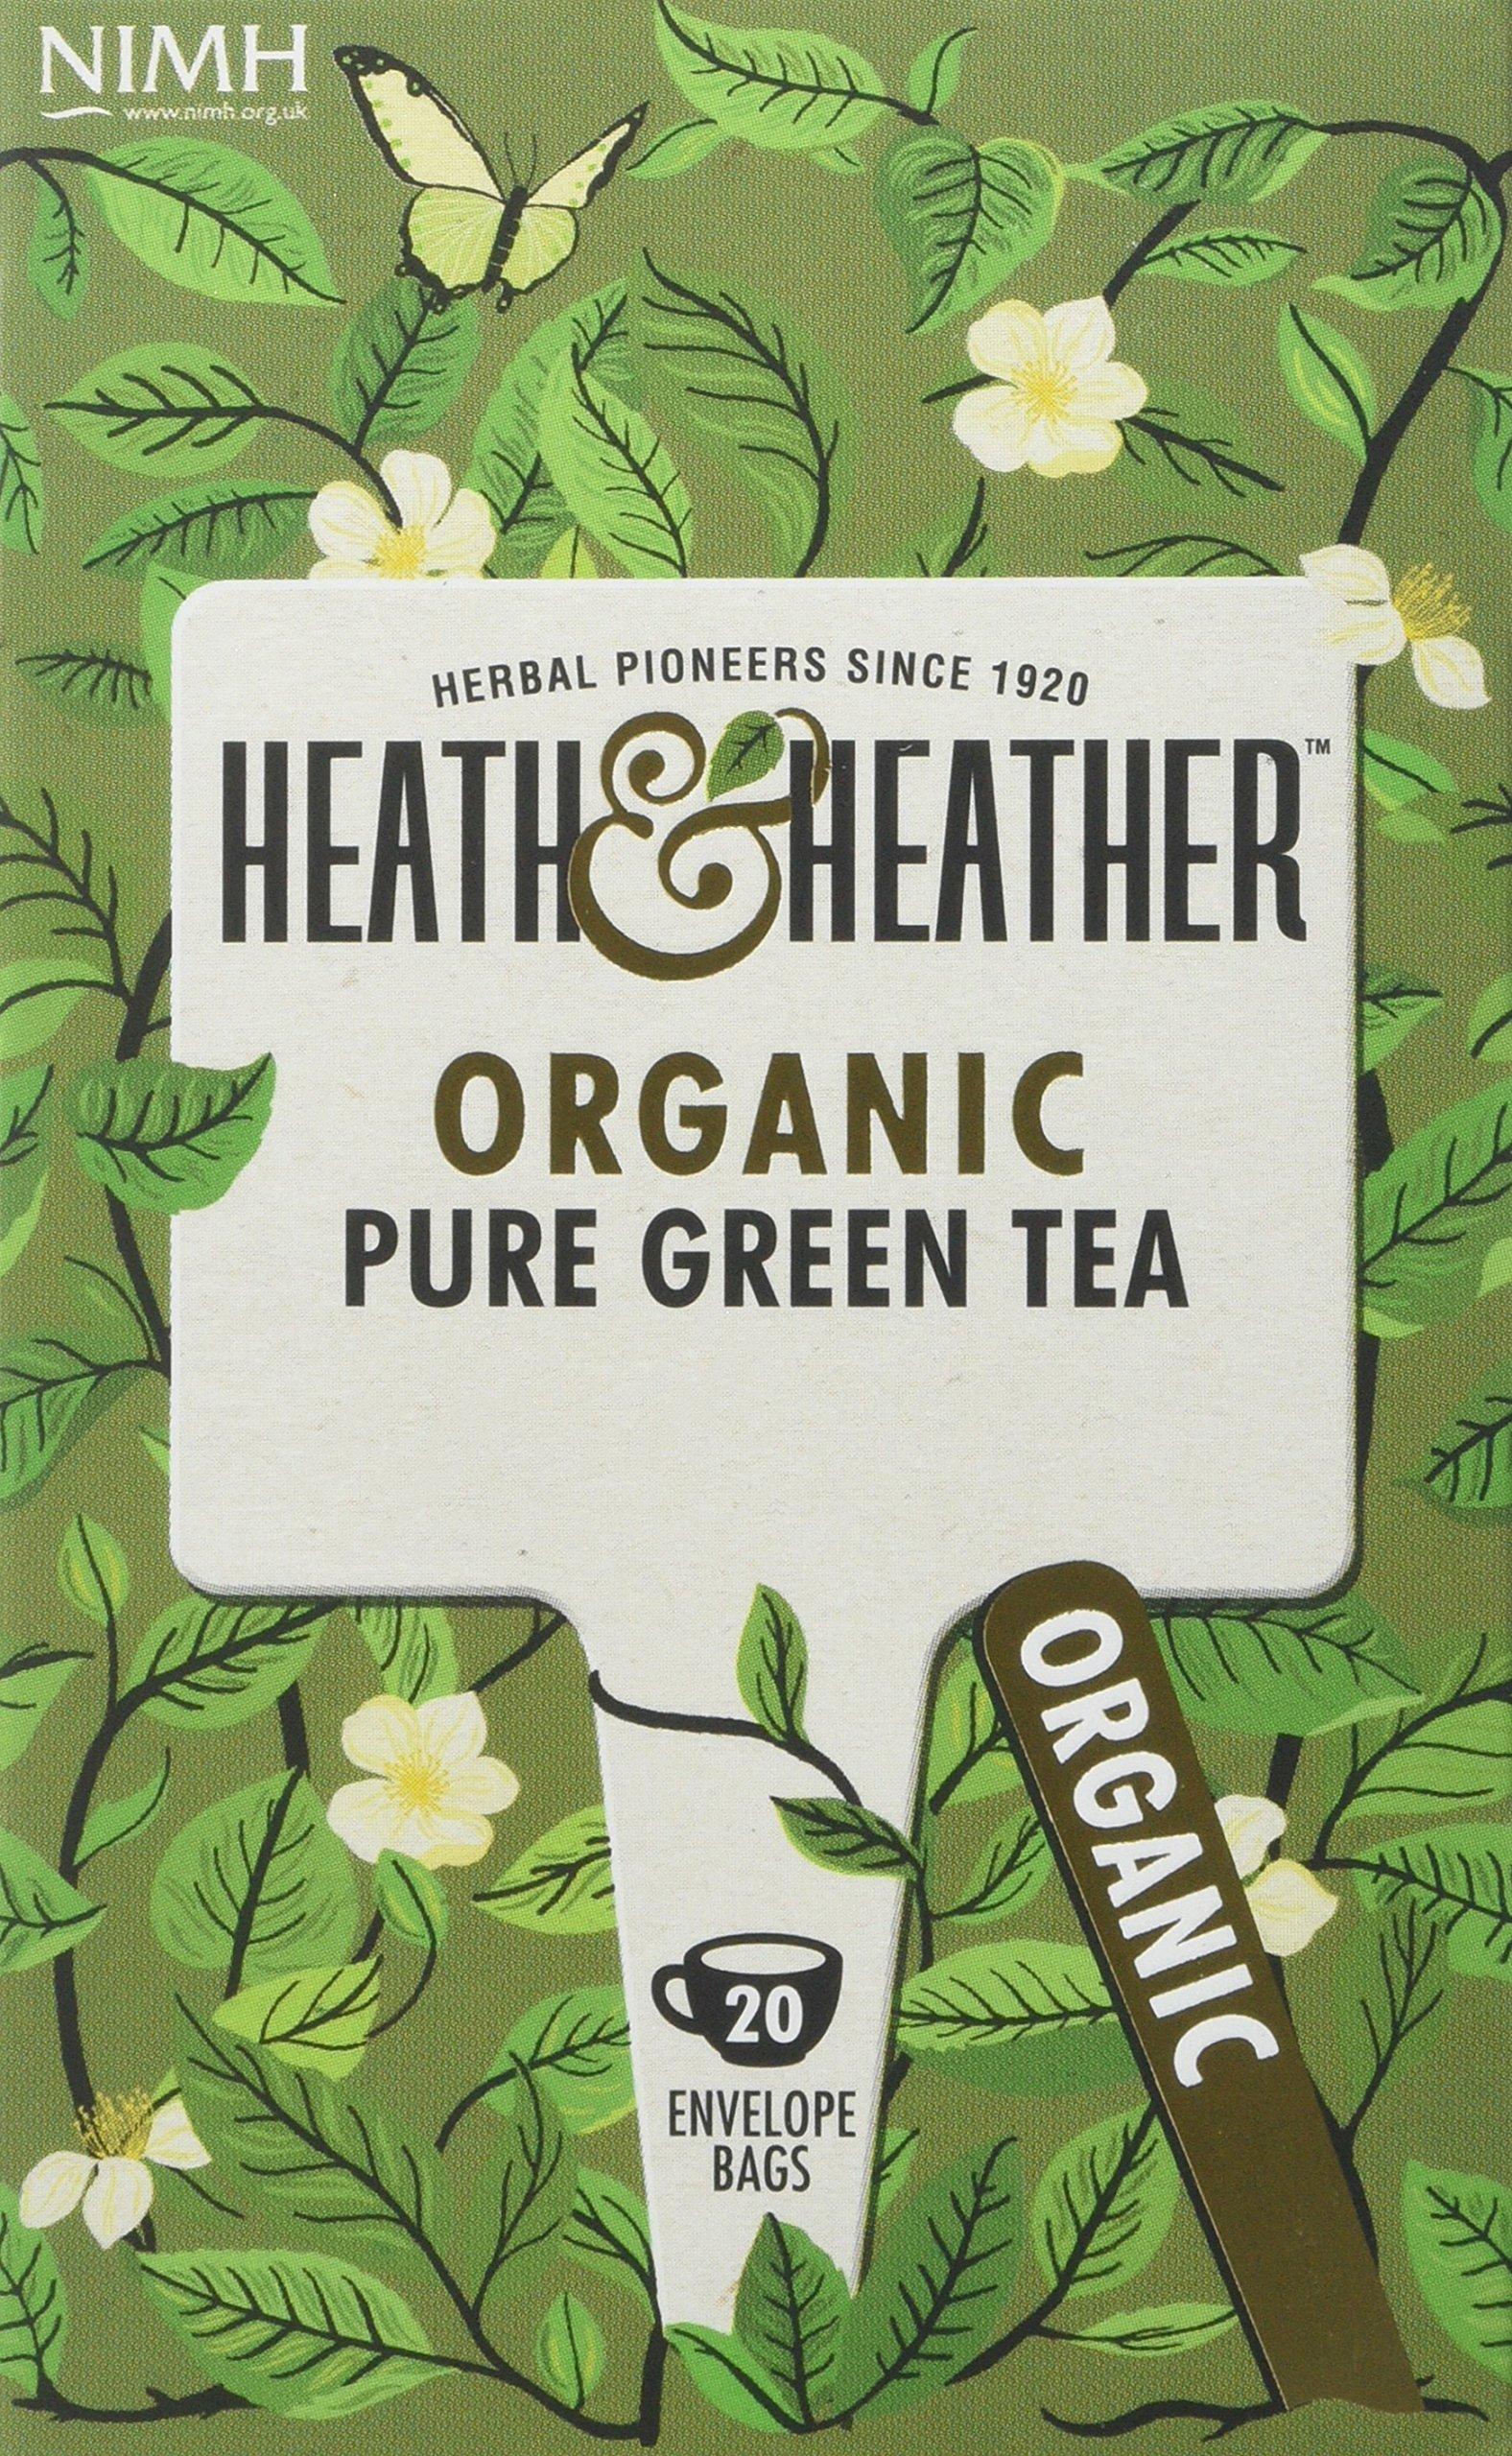 Heath & Heather organic green tea tea bundle (soil association) (green tea) (6 packs of 20 bags) (120 bags) (brews in 2-3 minutes)